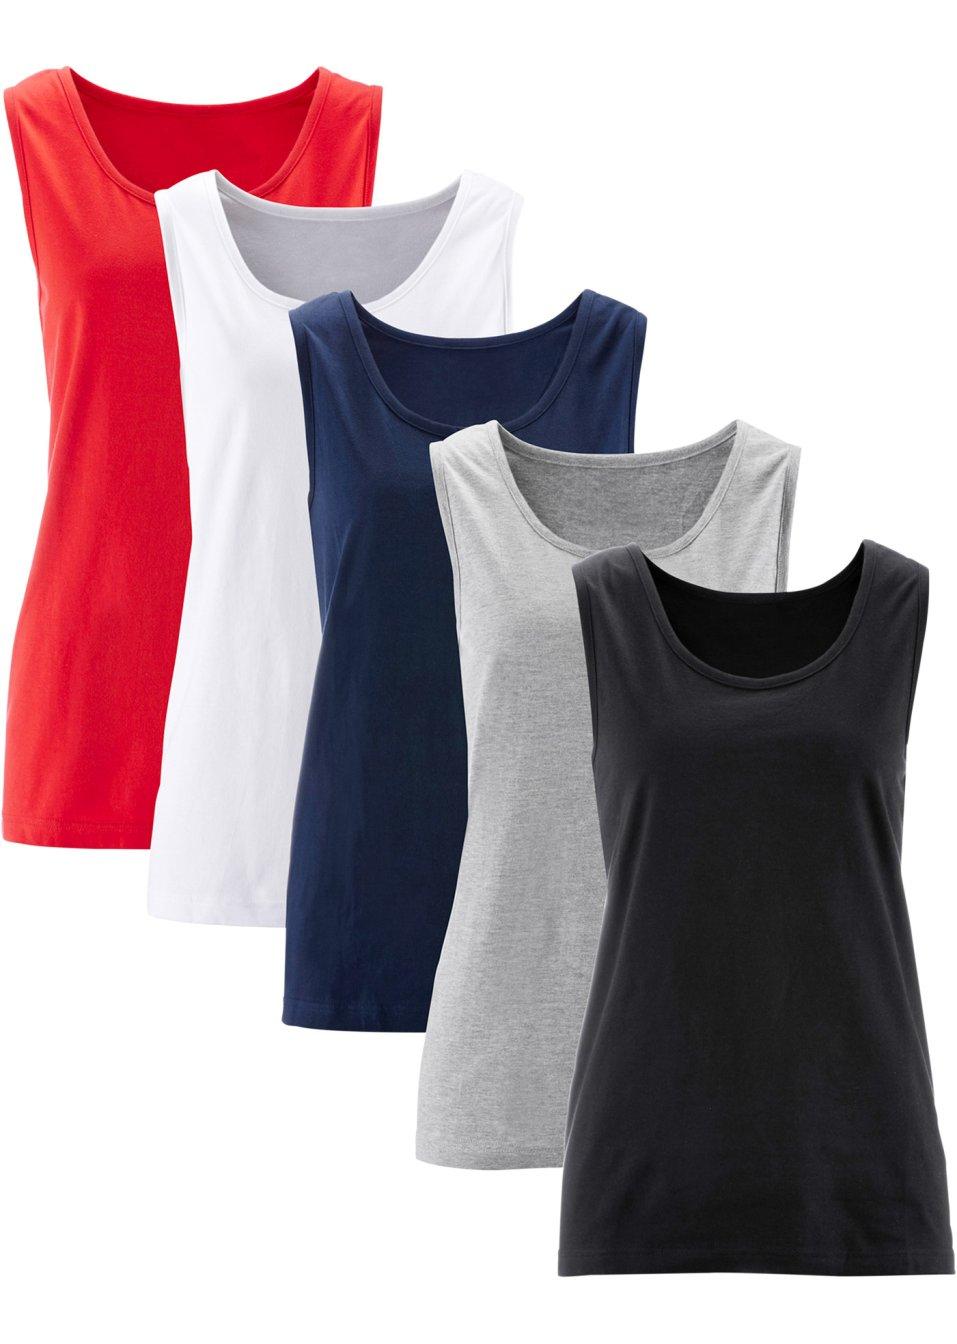 Bequemes Long-Top in Single Jersey - erdbeere + schwarz + weiß + hellgrau meliert + dunkelblau 8gJGW gJbzq